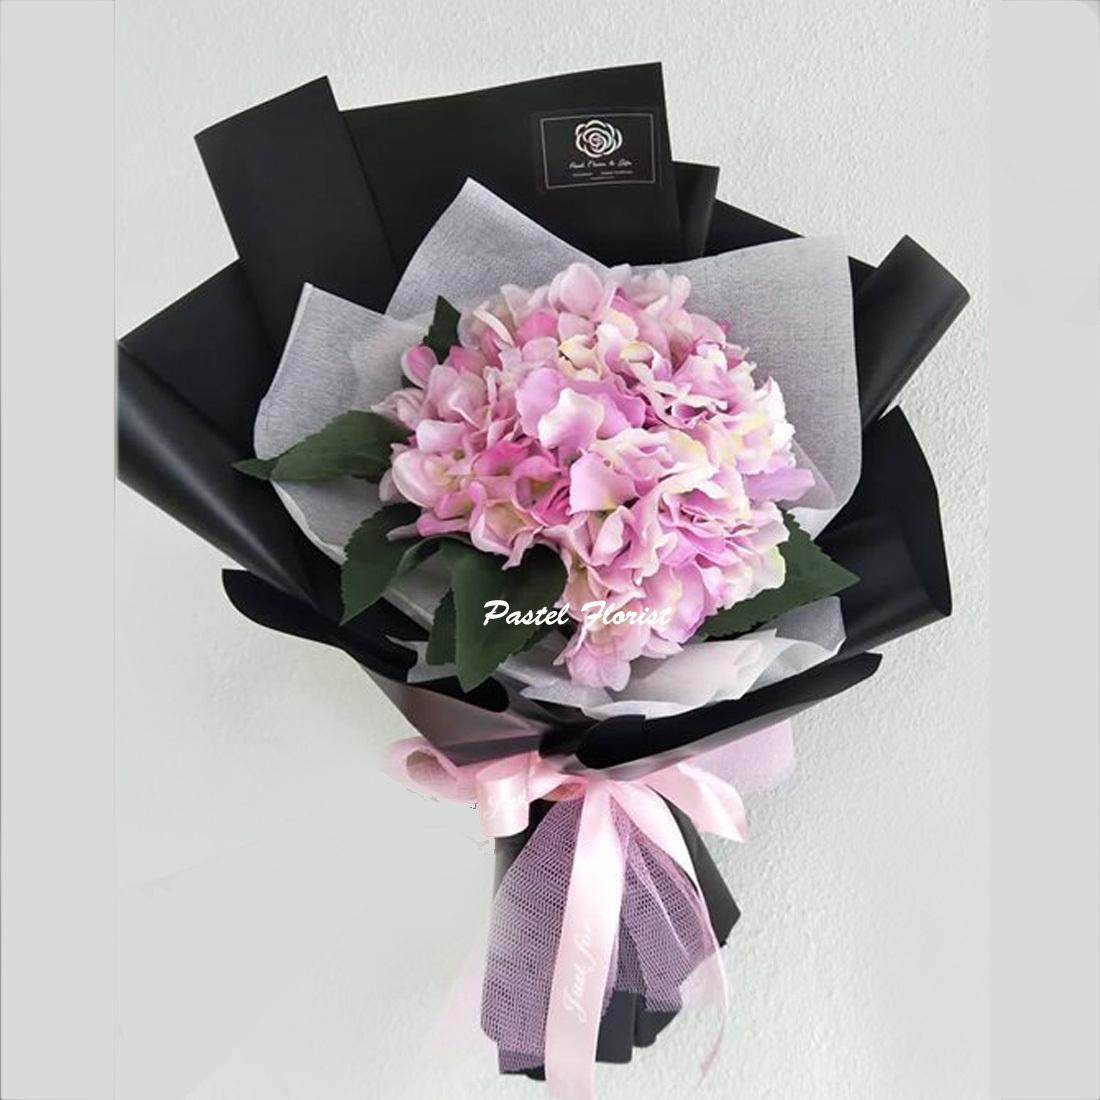 Artificial Hydrangea Bouquet – Pastel Flower & Gifts - Flower ...